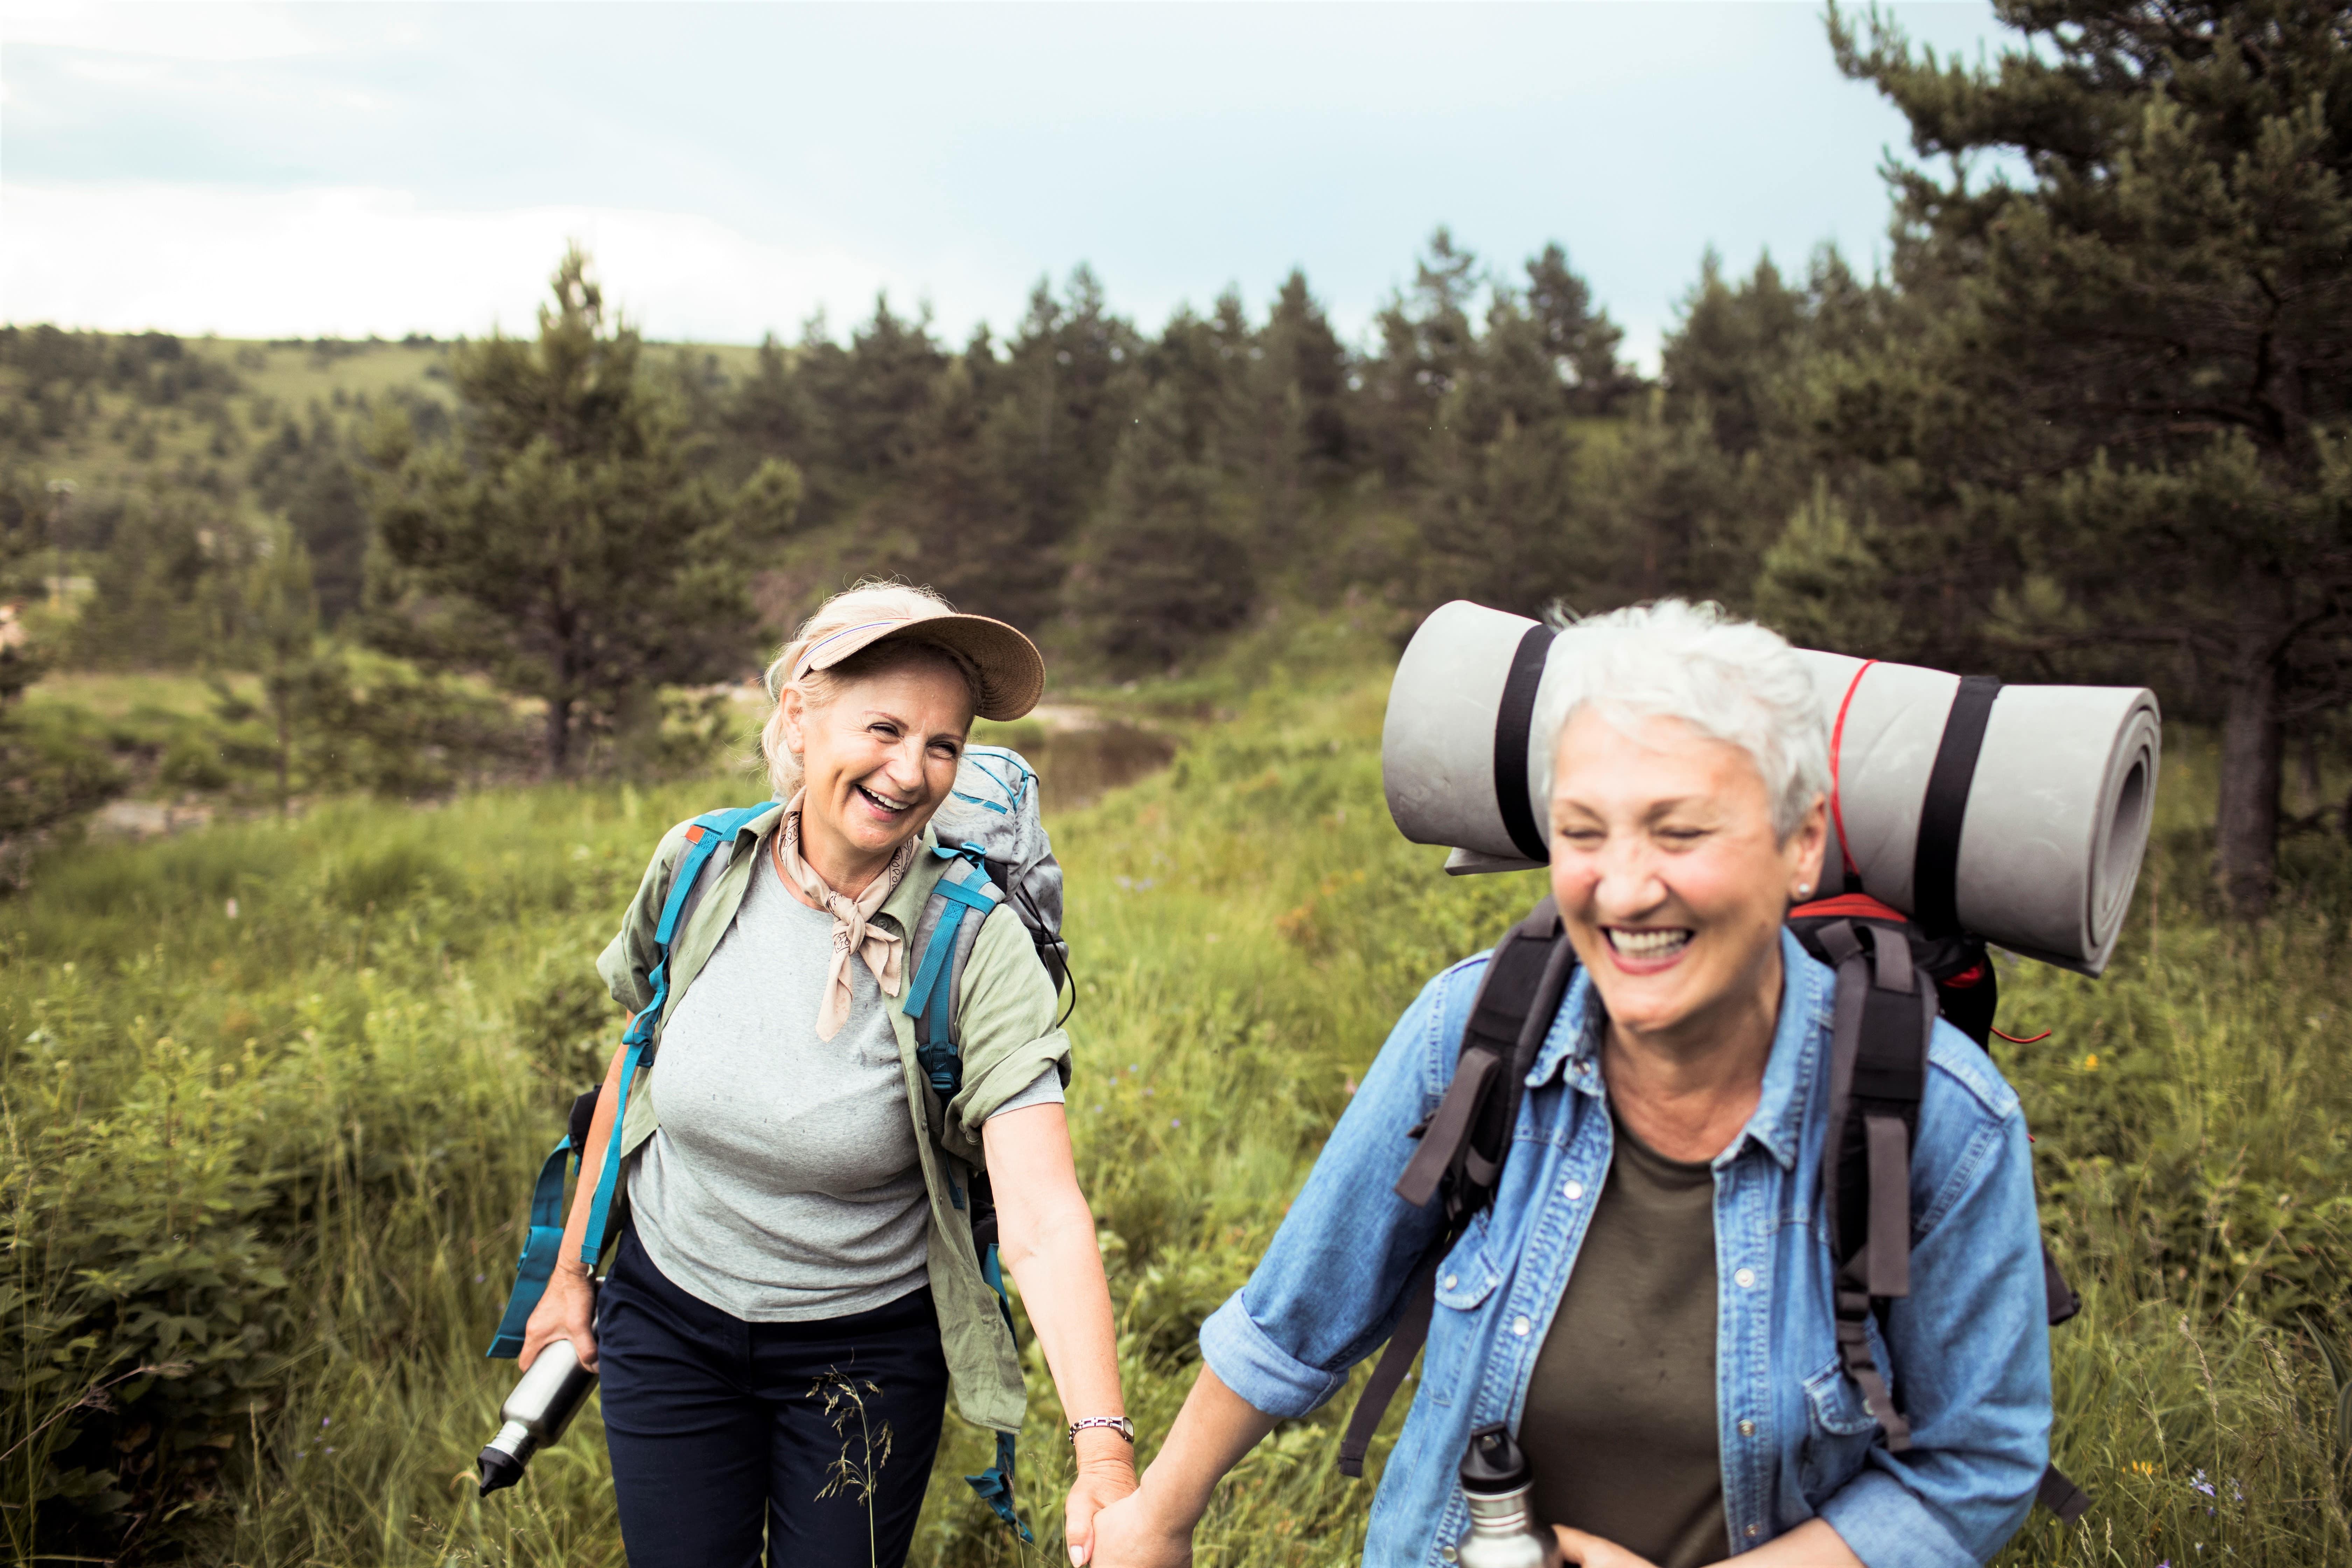 Lesbians hiking in Boulder Colorado